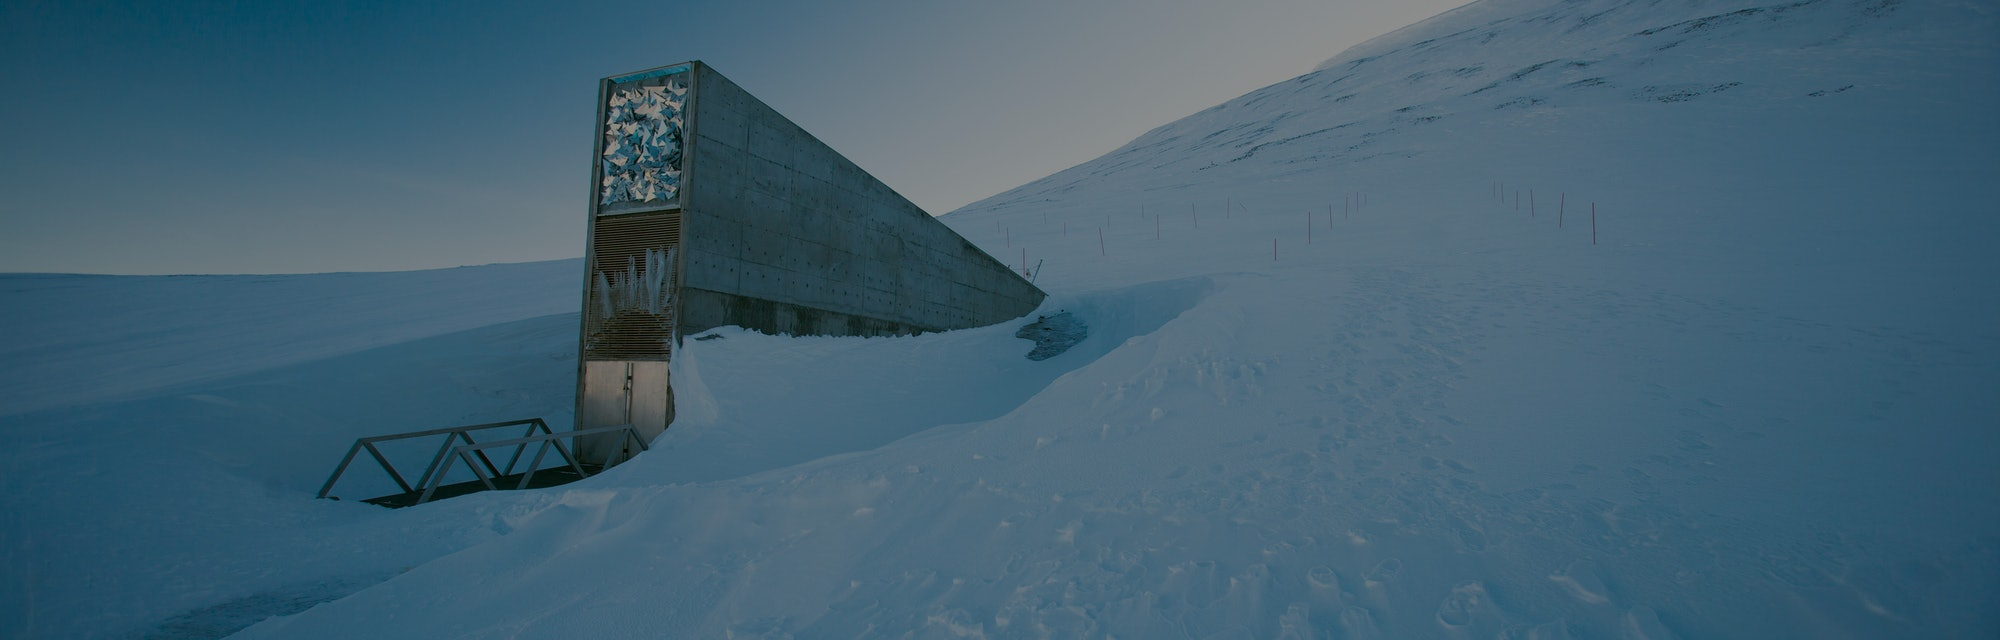 The entrance to the international gene bank Svalbard Global Seed Vault (SGSV) near Longyearbyen on S...